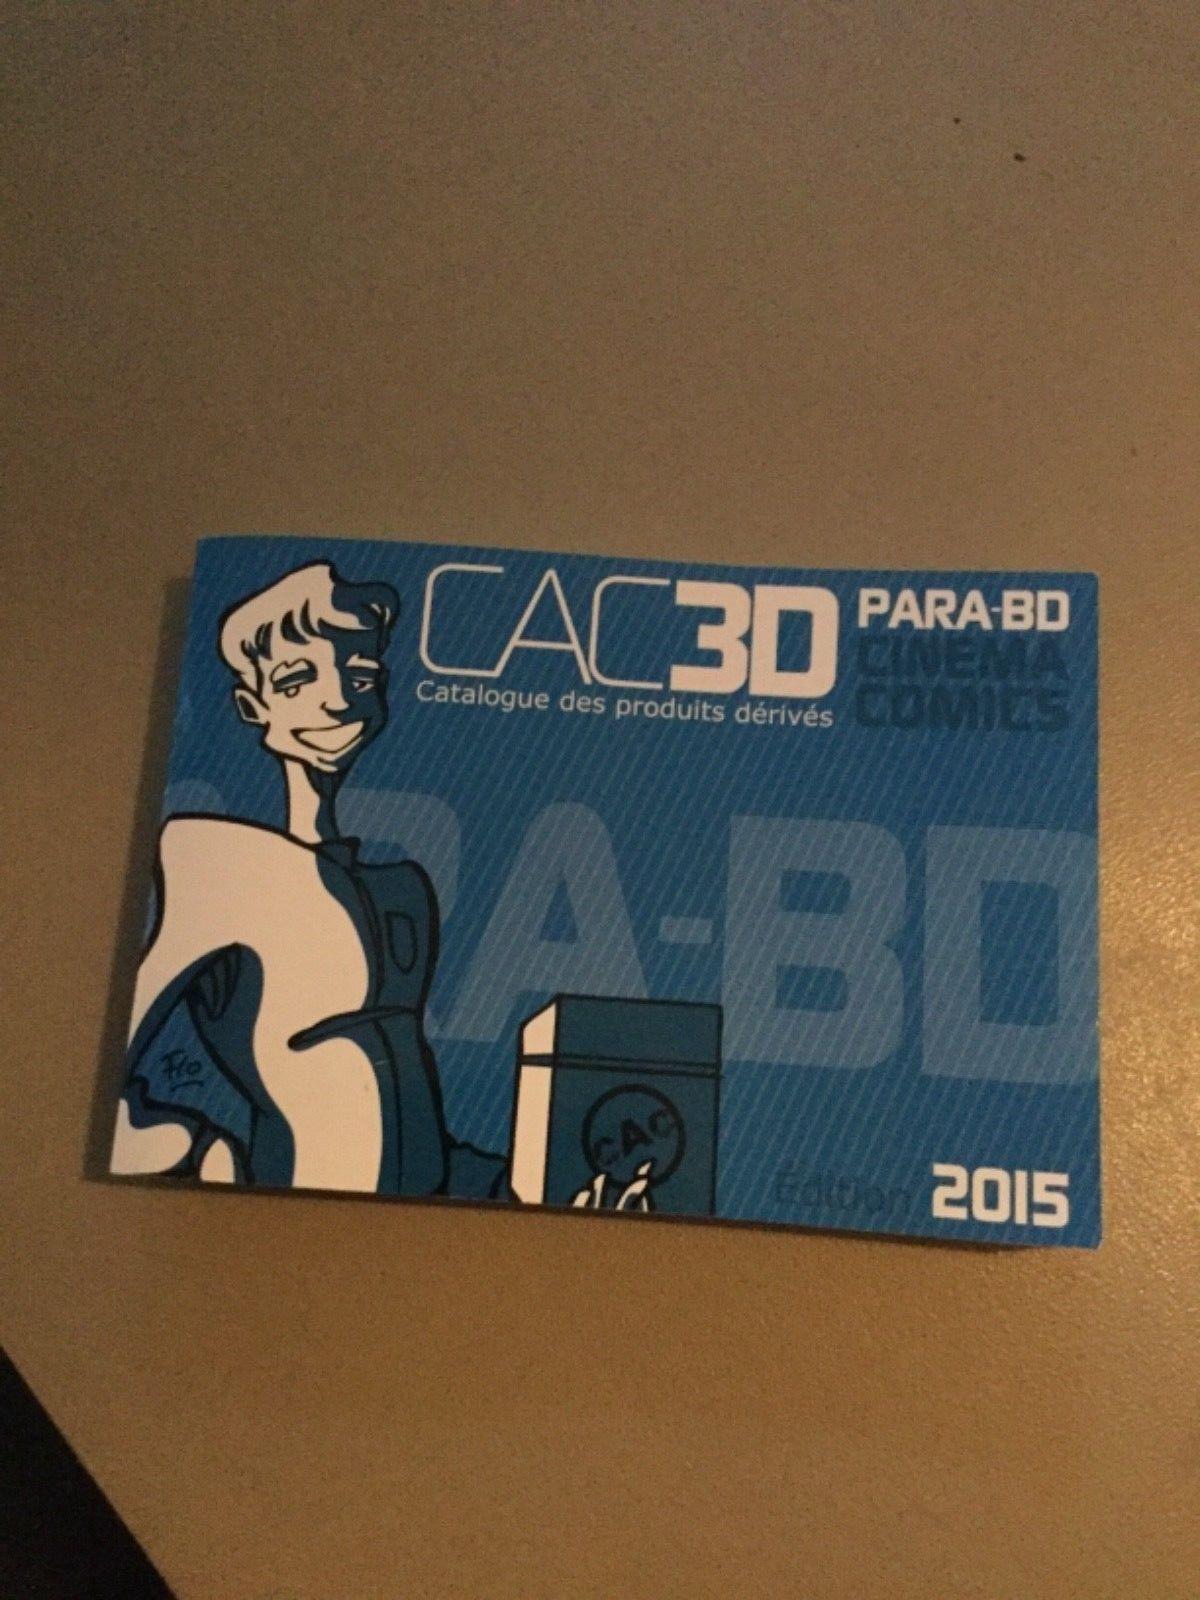 Catalogue CAC3D para bd 2015 Avec : TINTIN / Kuifje Aroutcheff Leblon fariboles